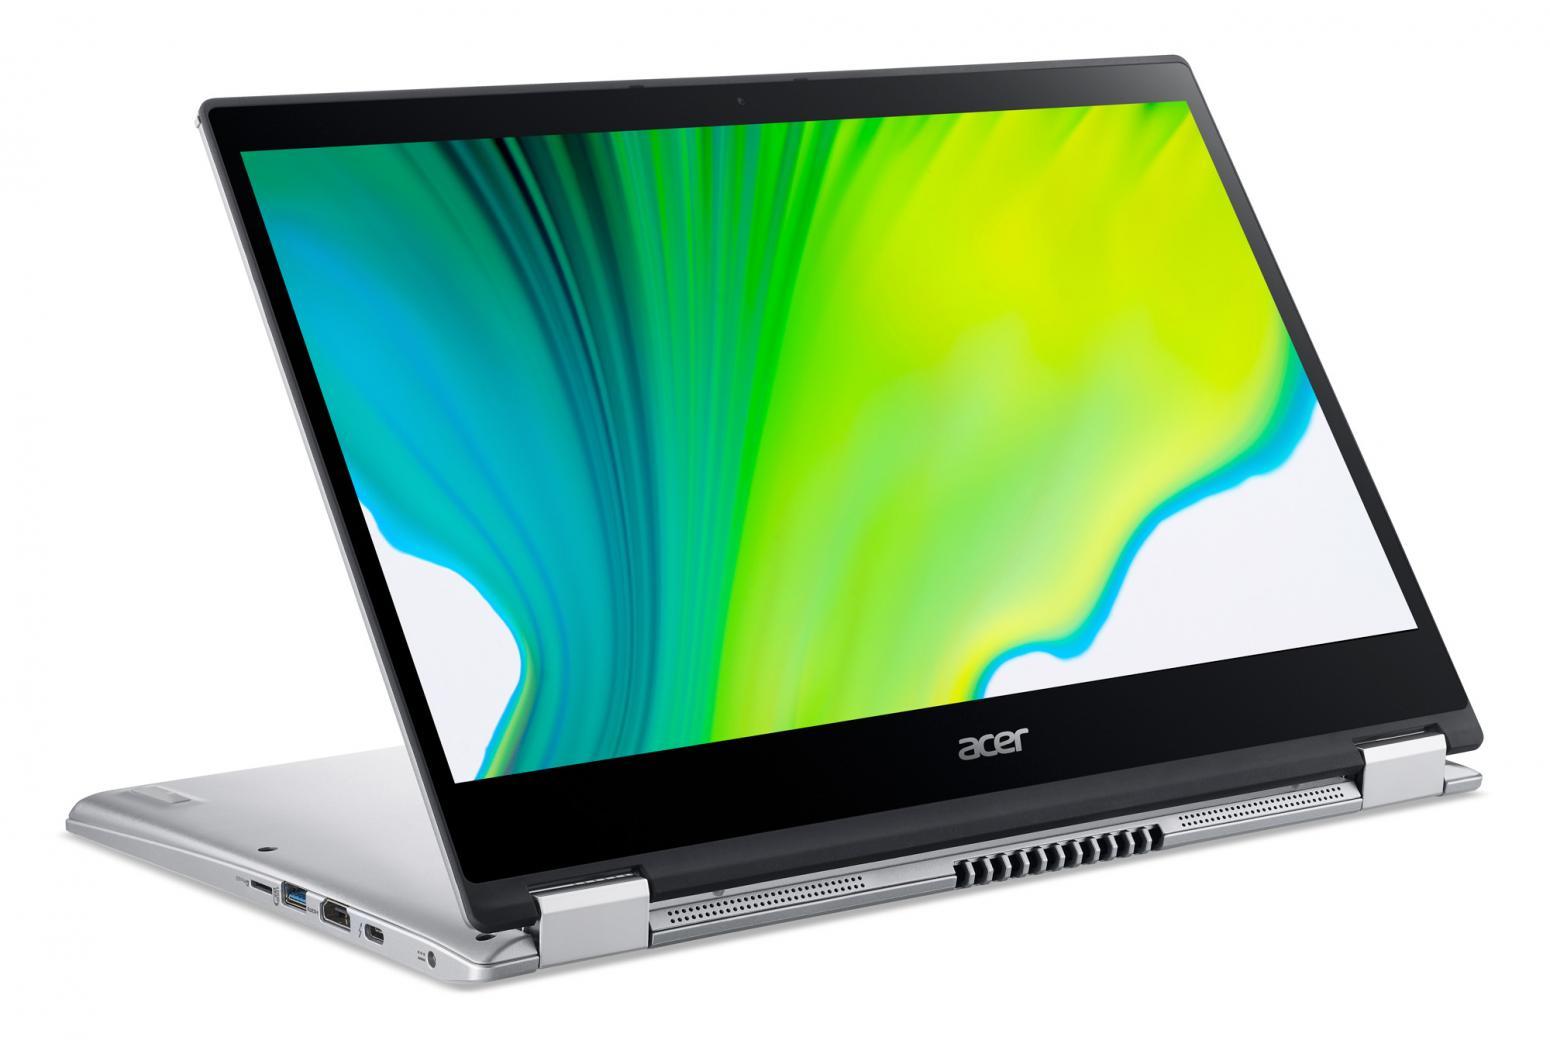 Ordinateur portable Acer Spin 3 SP314-54N-52H9 Argent - Tactile, Stylet - photo 5